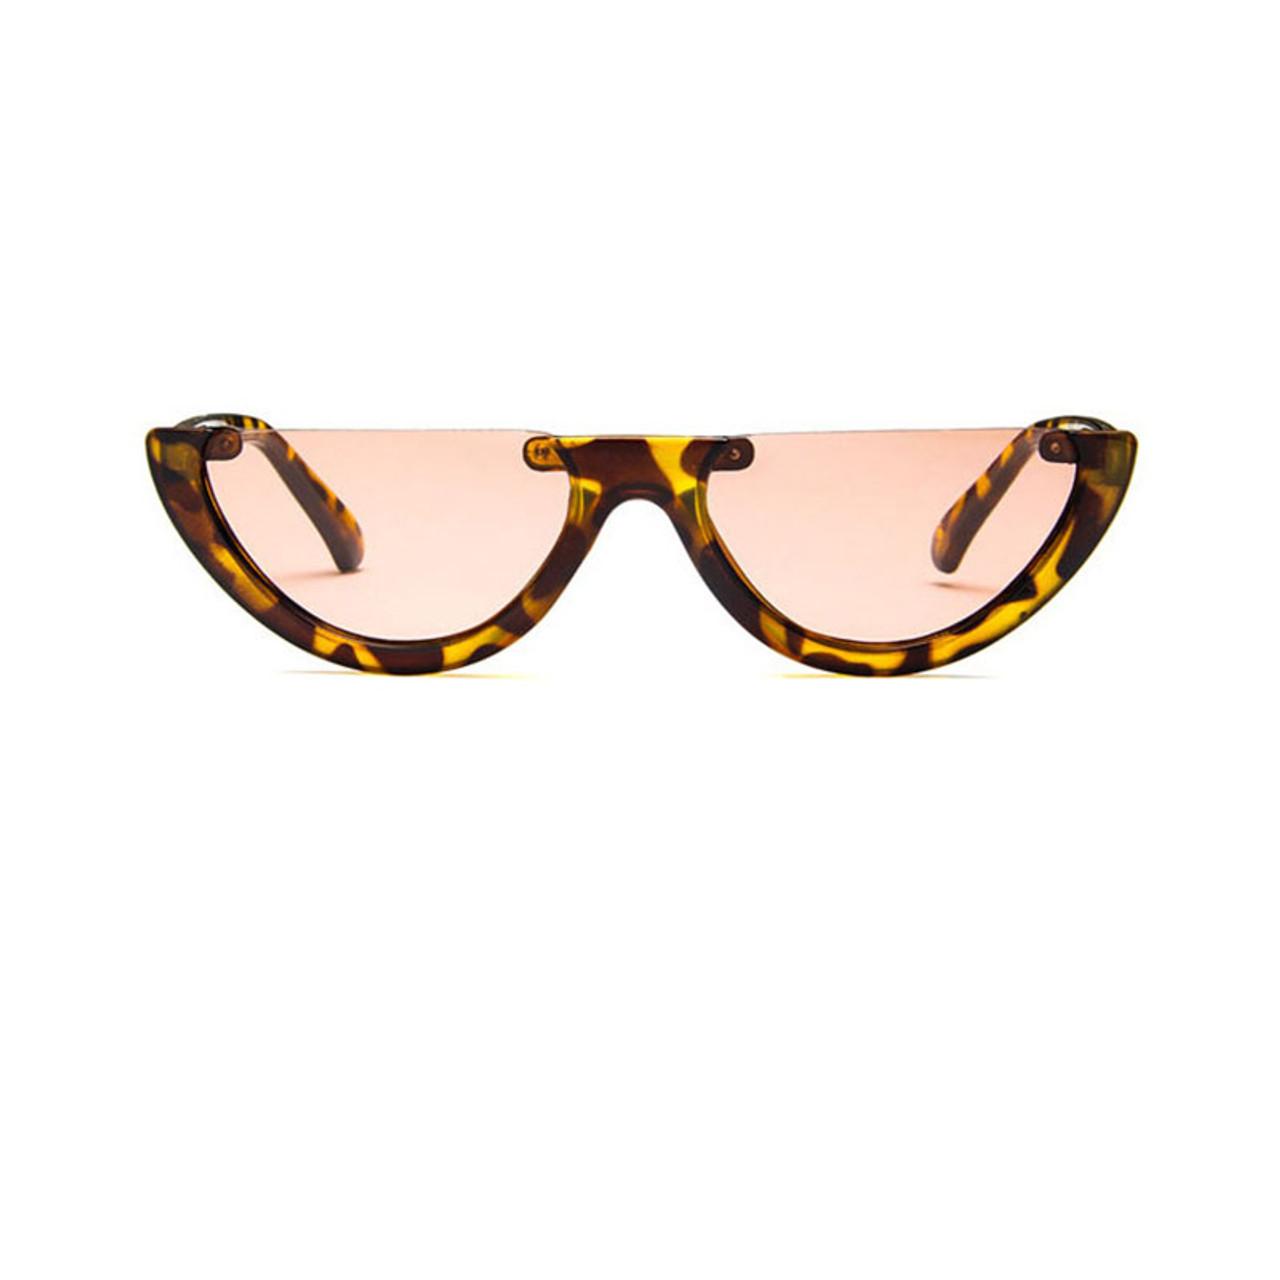 95c1e5c60b2 Sunglasses Cool Trendy Half Frame Rimless Cat Eye Sunglasses Women 2018  Fashion Clear Brand Designer Sun ...